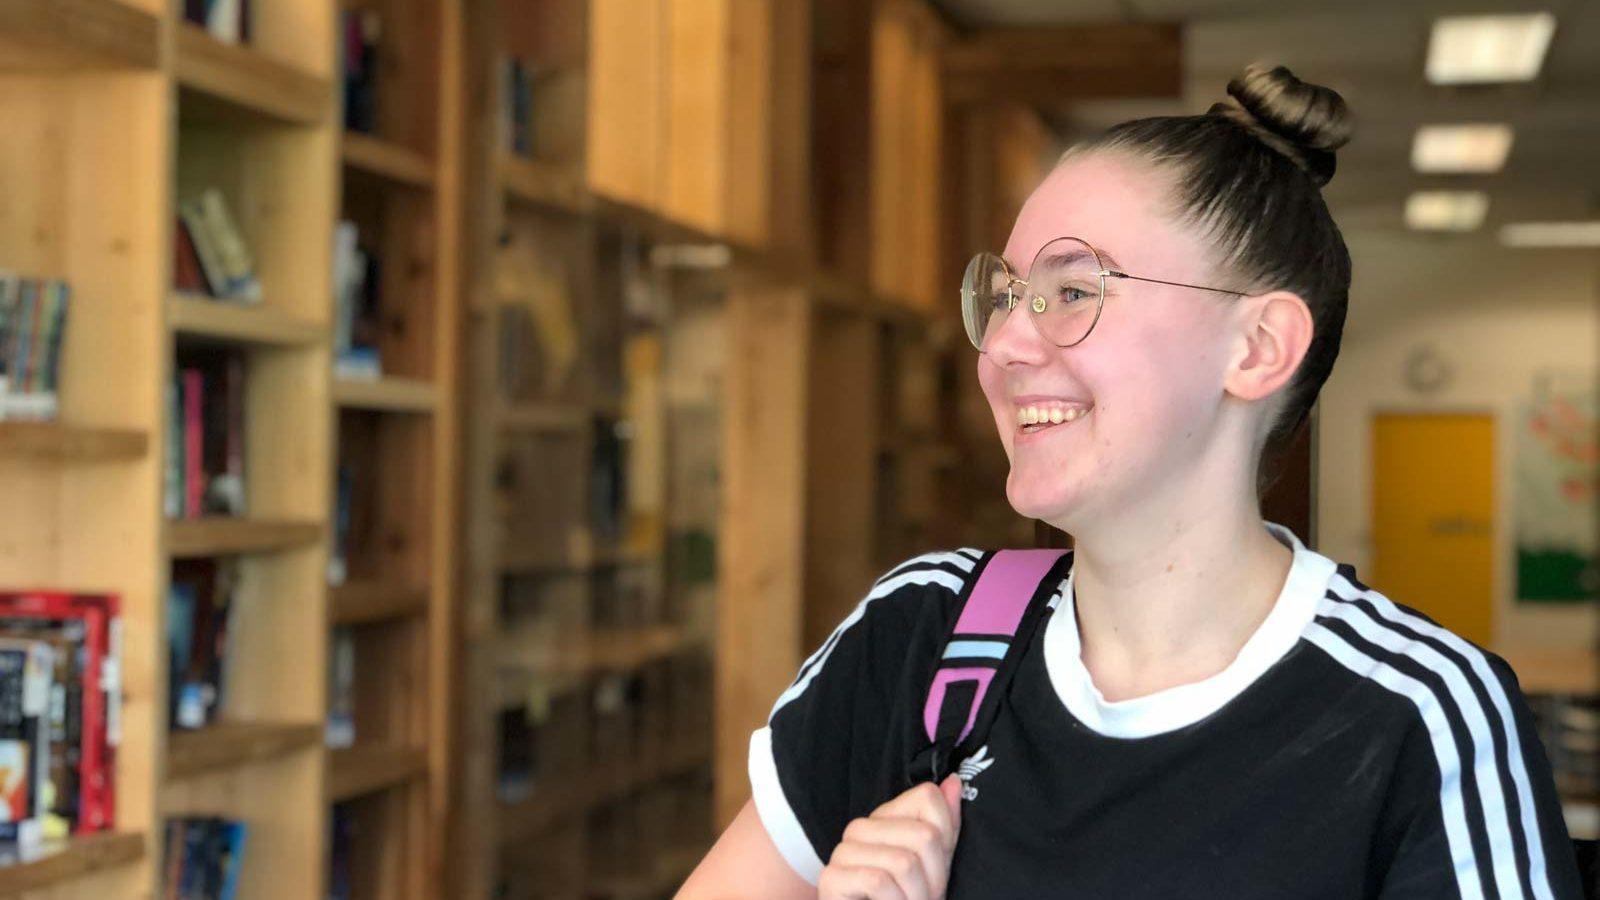 grade 8 -12 English senior student